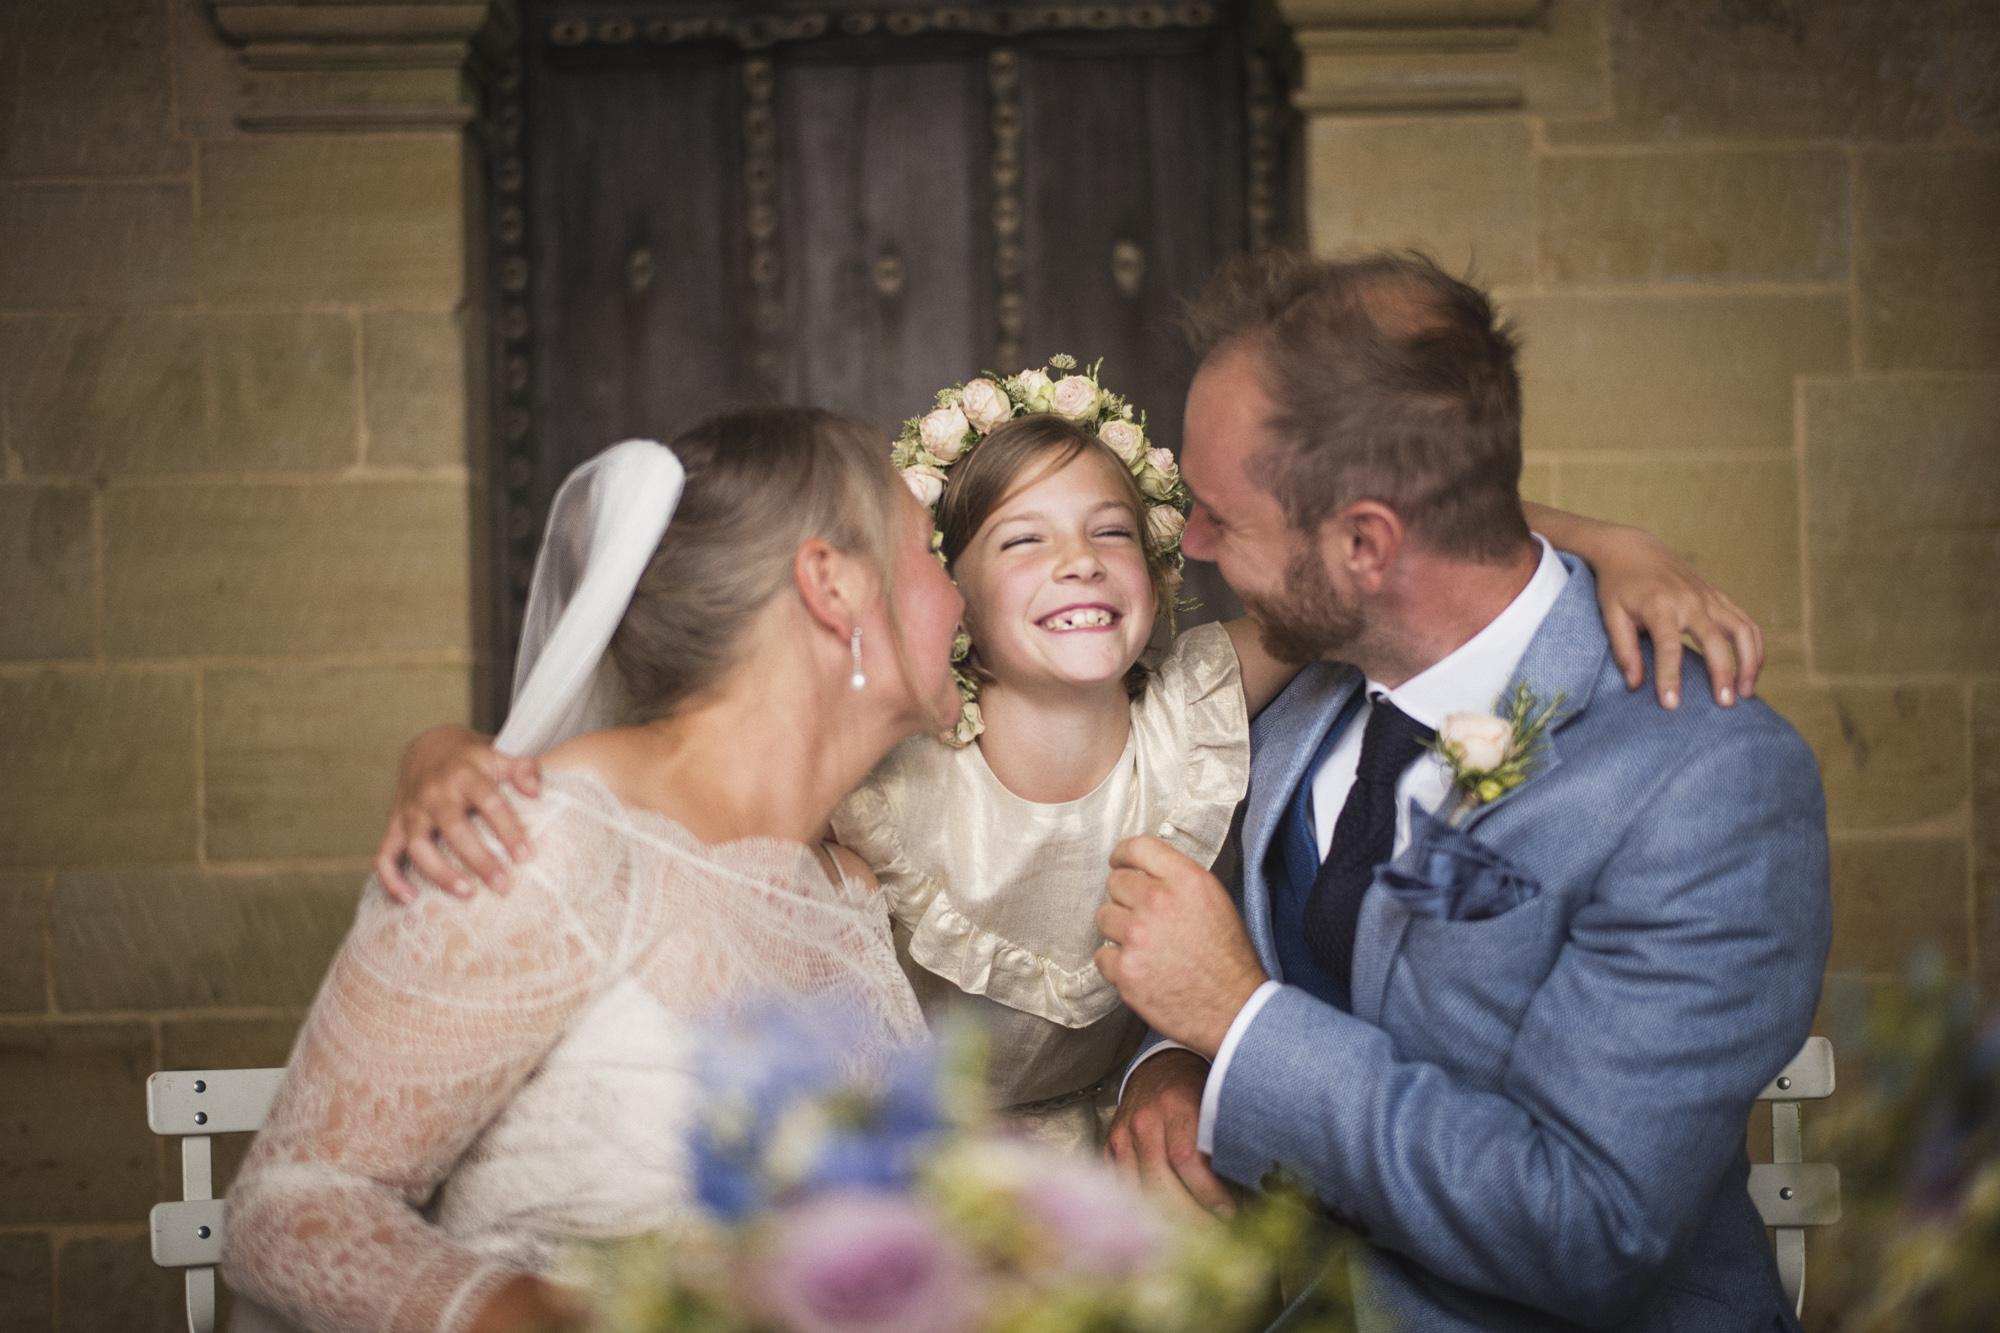 Jaz-Kate-Beaumont-Oyster-Silk-Bias-Cut-Wedding-Gown-Larkspur-Lace-Top-Sussex-Wedding-12.jpg